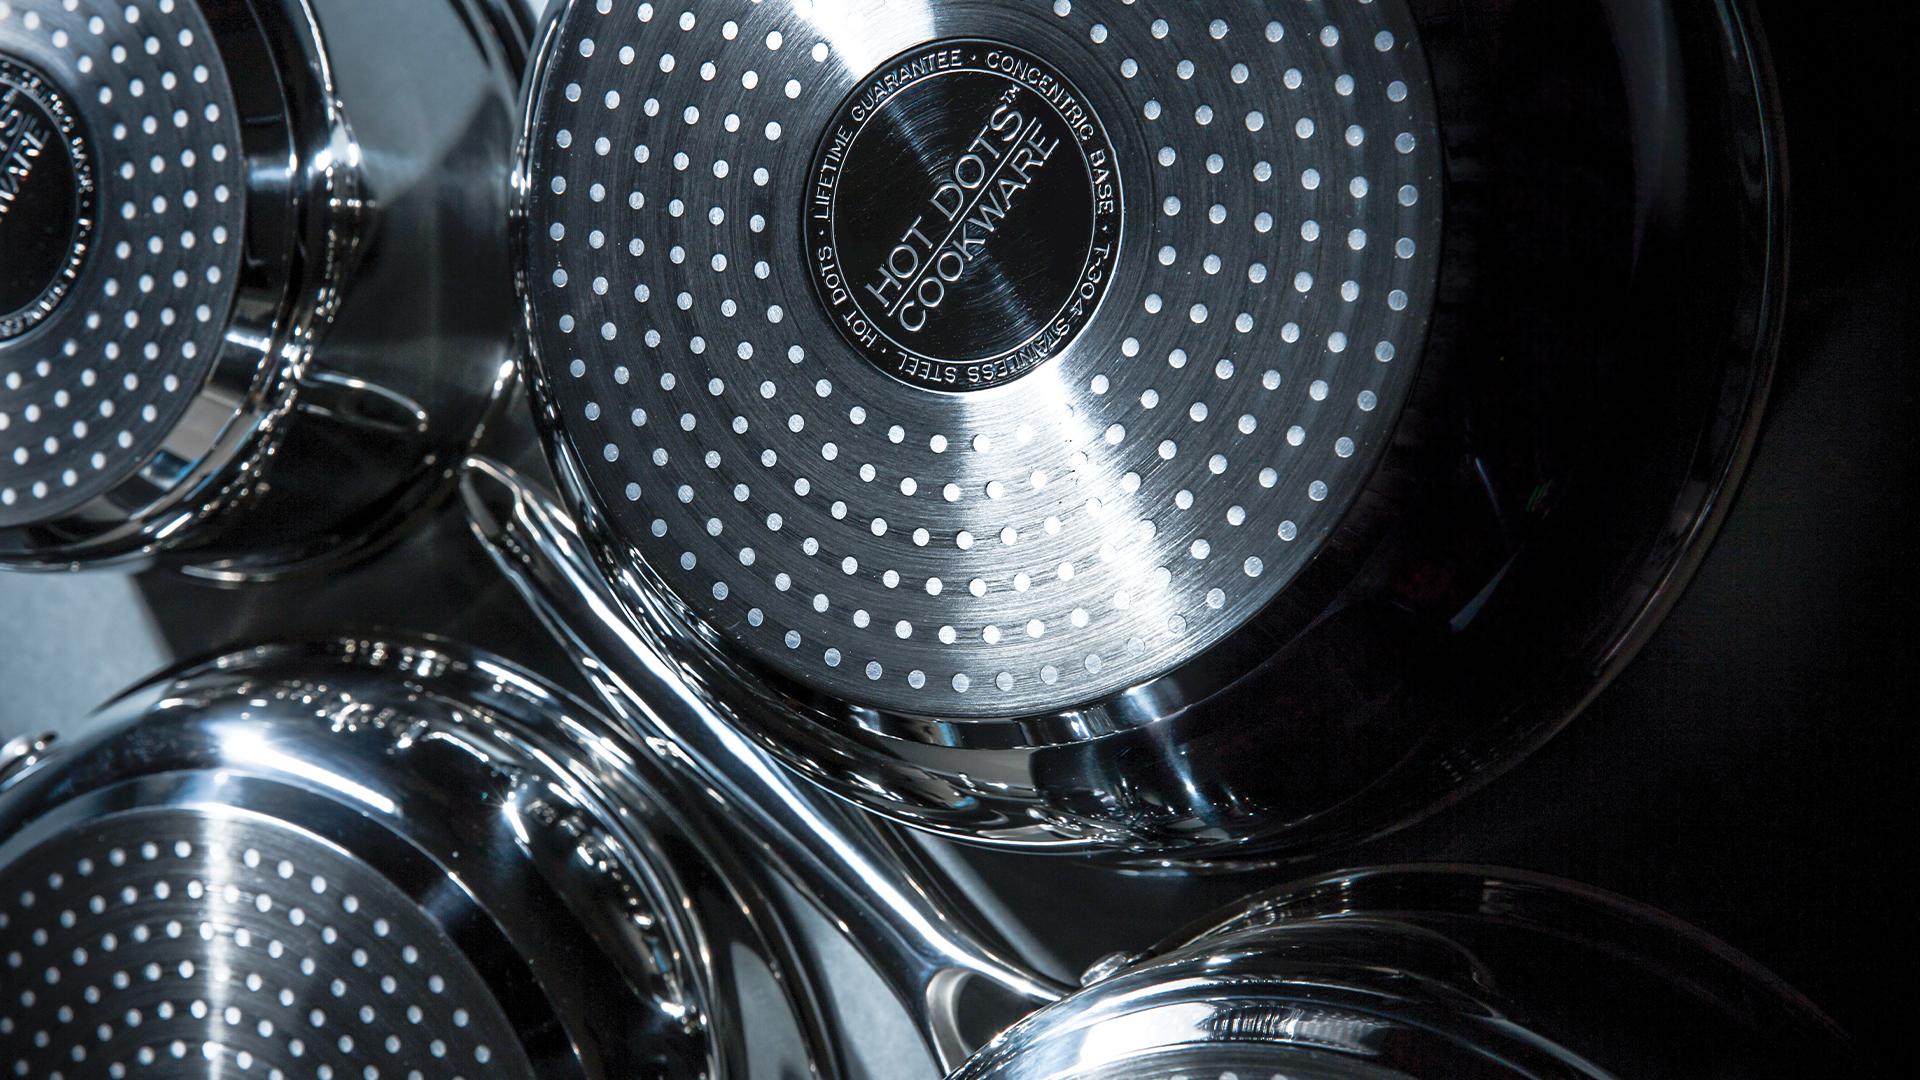 Hot Dots Cookware - Visit WebsiteWarranty Info